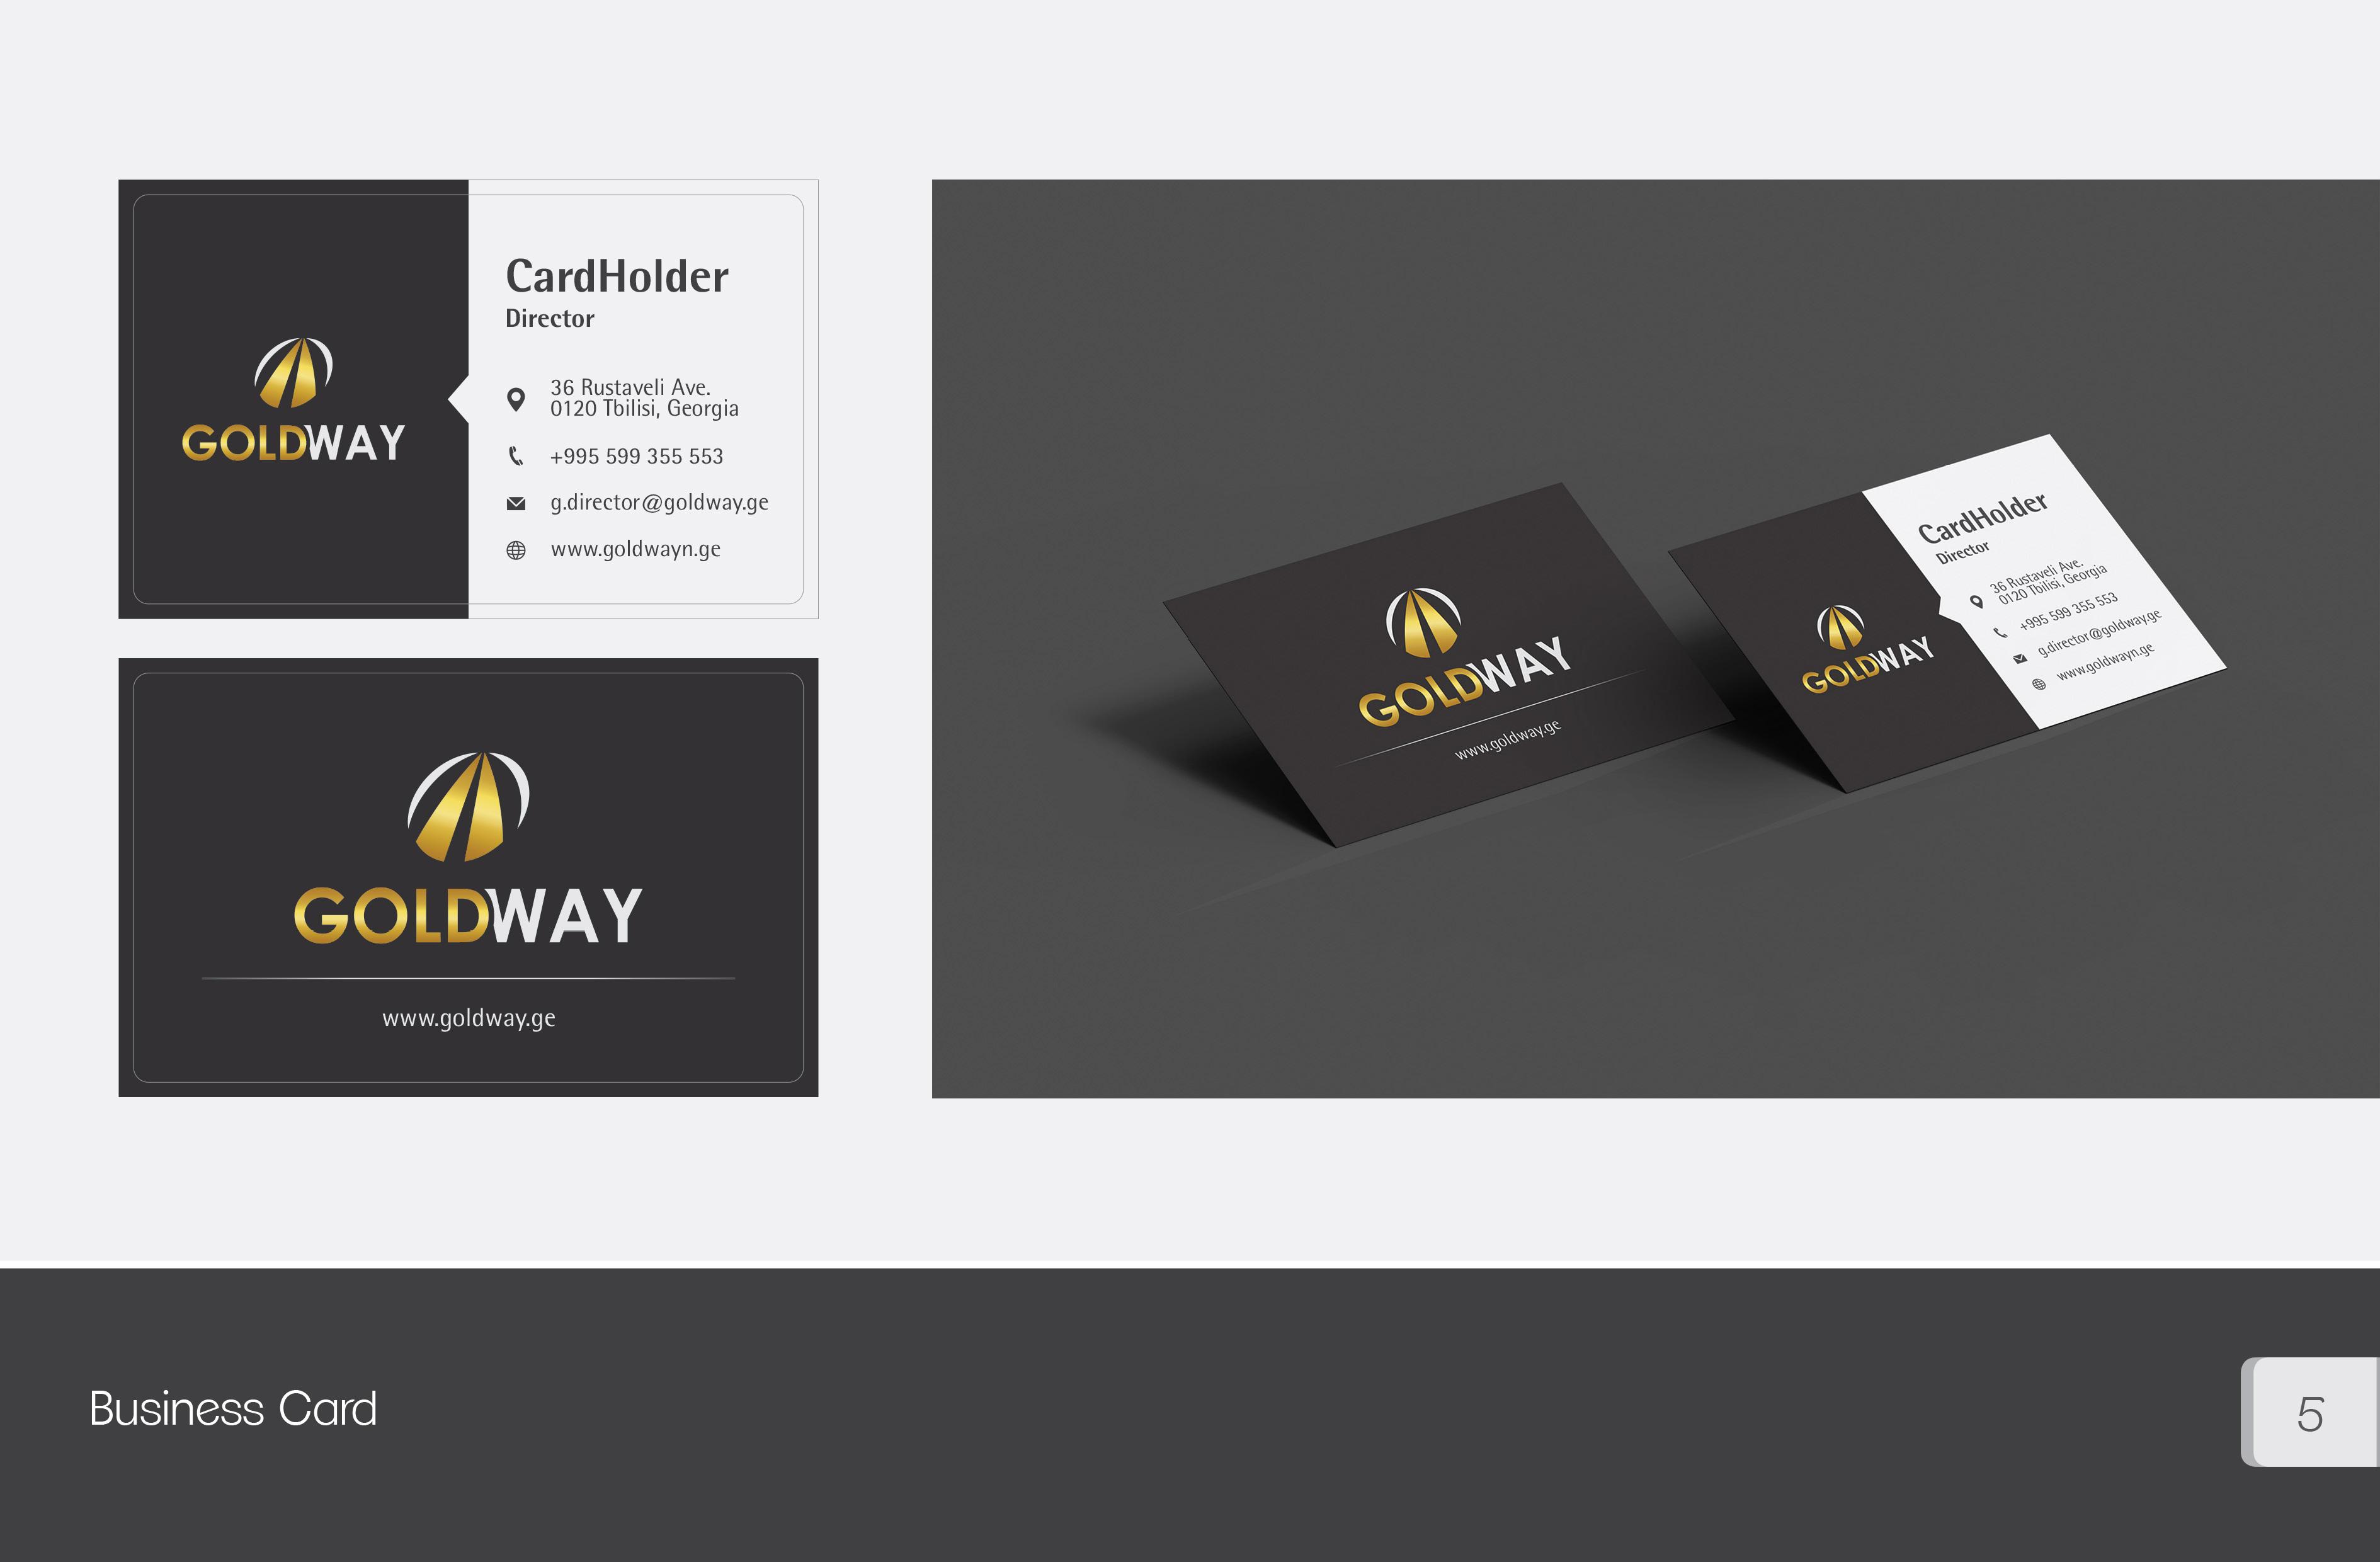 Goldway business card design, ლოგოს დამზადება, ლოგოს დიზაინი, ლოგოების შექმნა, ლოგოების დამზადება, ლოგოს დამზადების ფასი, ბრენდინგი, ბანერების დამზადება, ლოგოტიპის შექმნა, ლოგოტიპების დიზაინი, ოპტიმიზაცია, facebook დიზაინი, ვებგვერდის დიზაინი, ლოგოების დიზაინი, ლოგოტიპების დამზადება, saitebis damzadeba, logoebis damzadeba, saitis damzadeba, logos damzadeba,